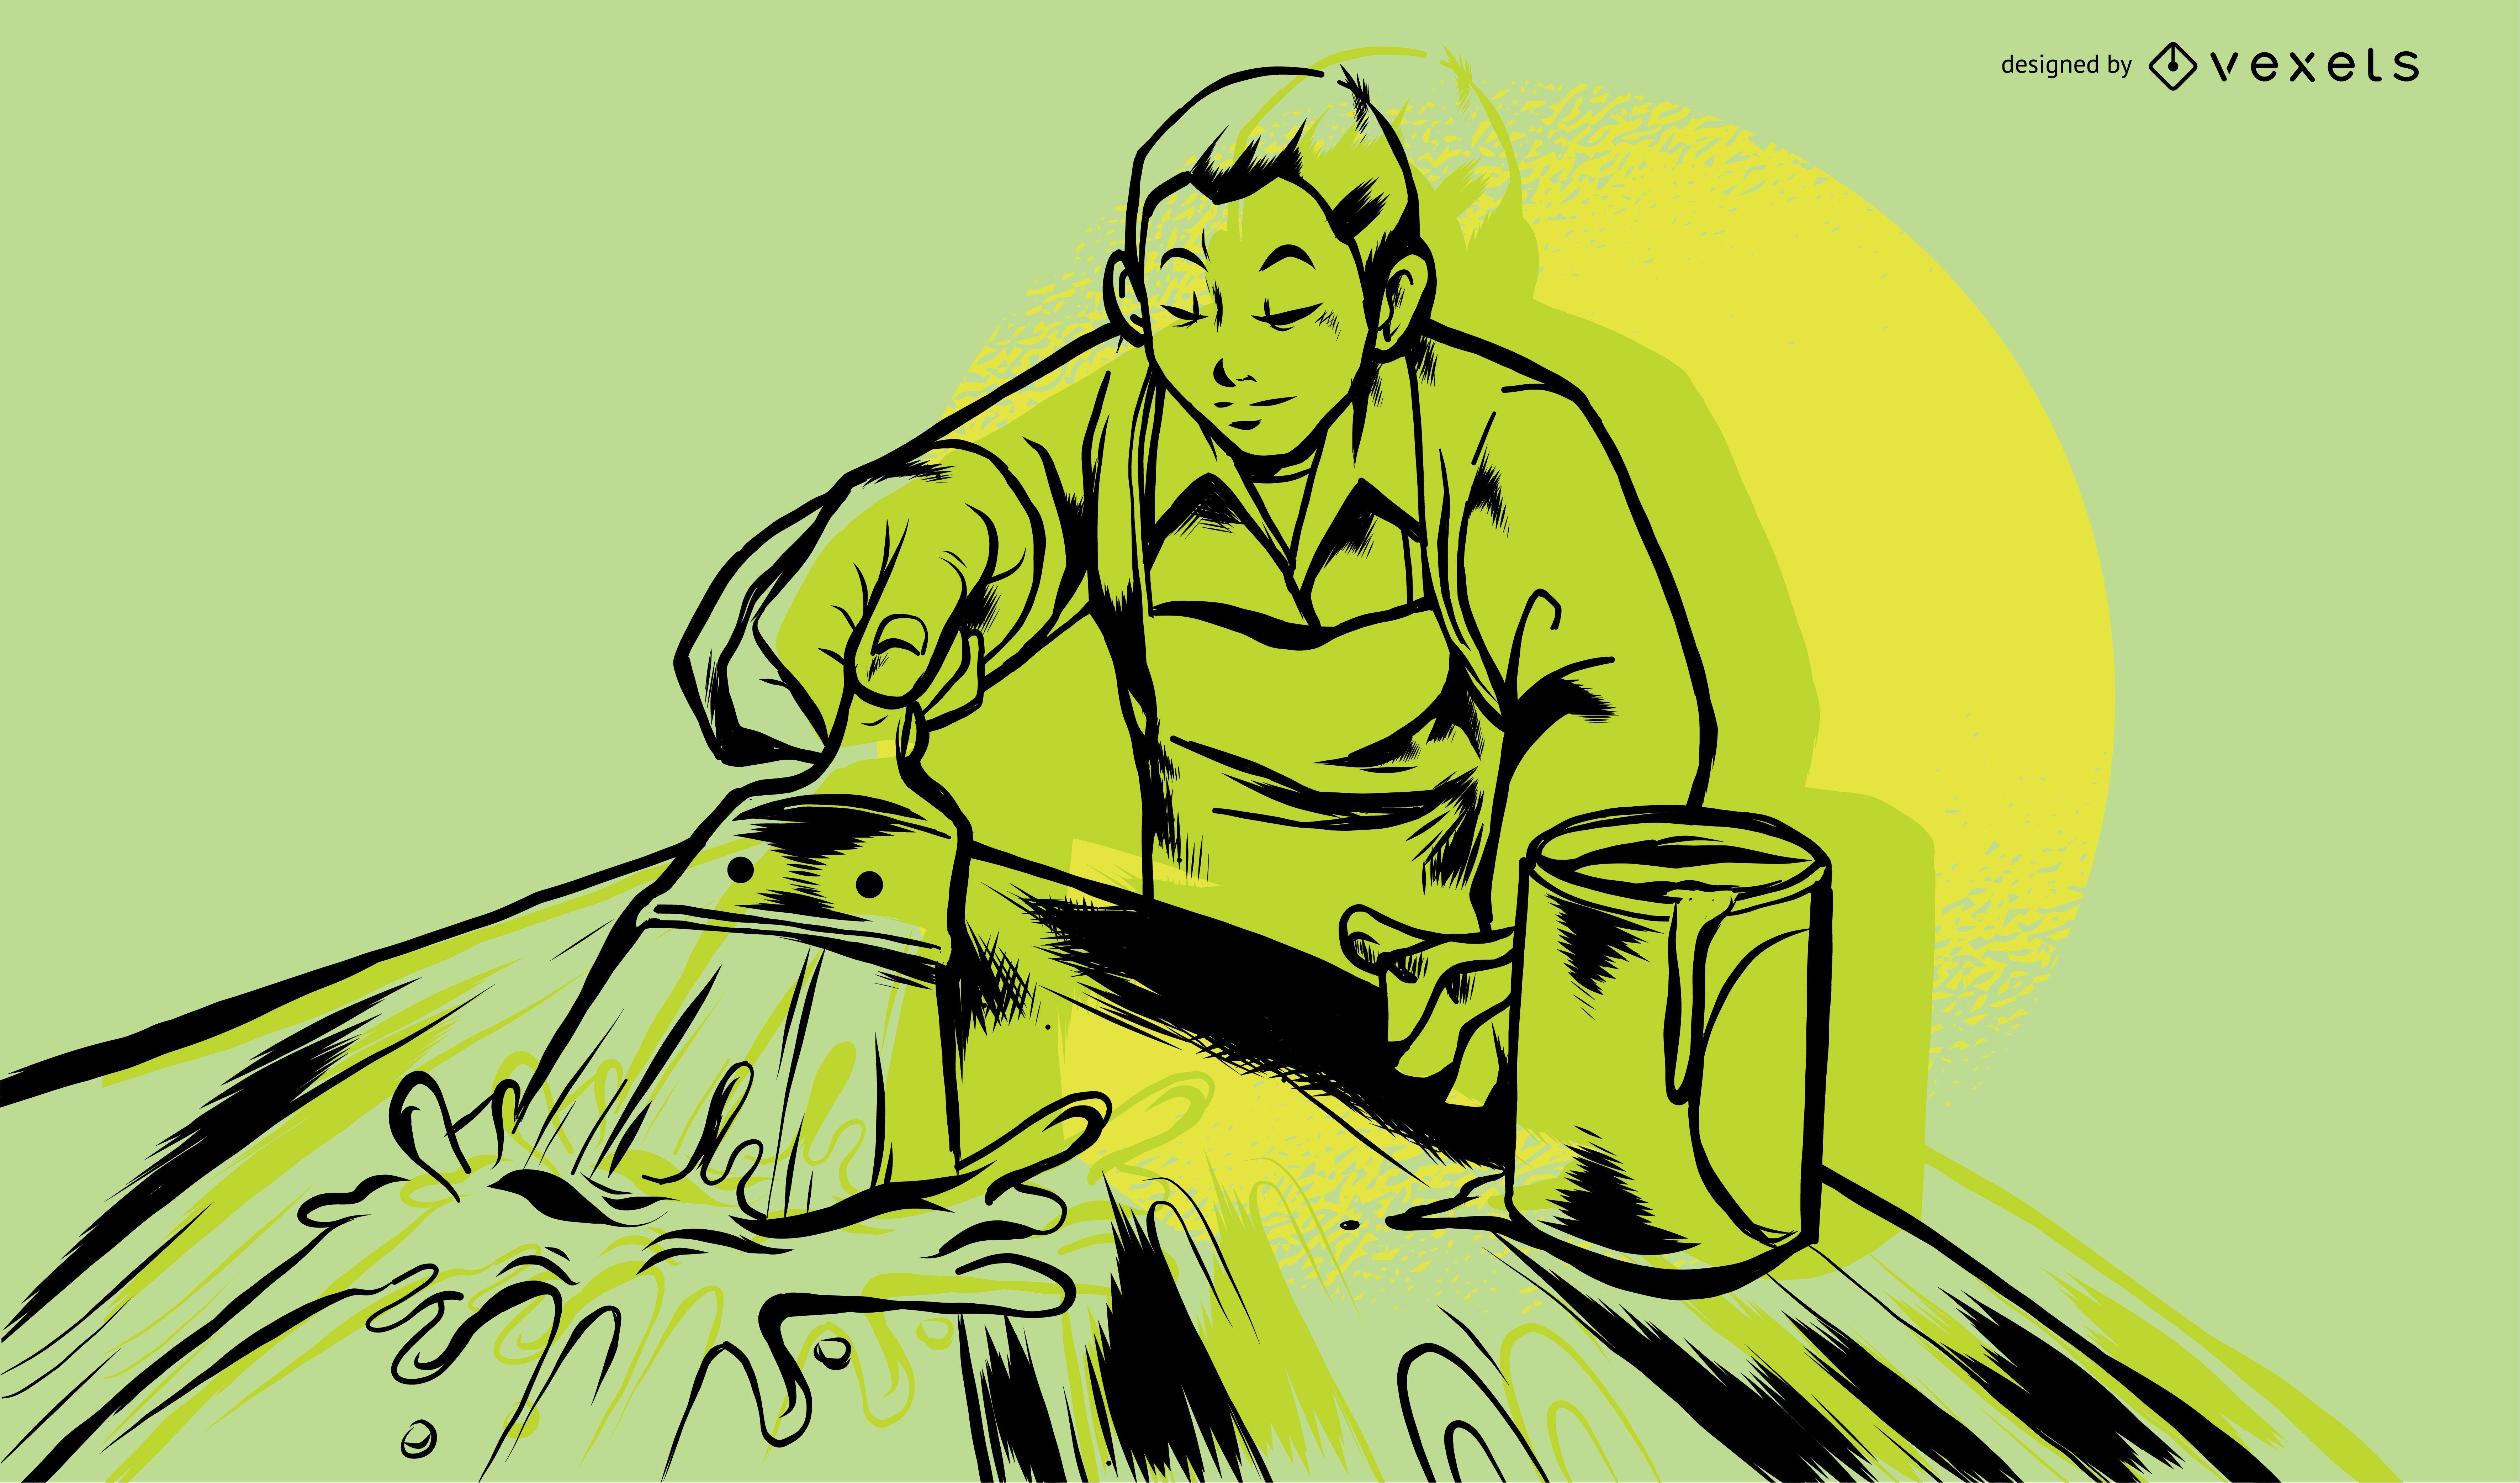 Wood Worker Painting Illustration Design